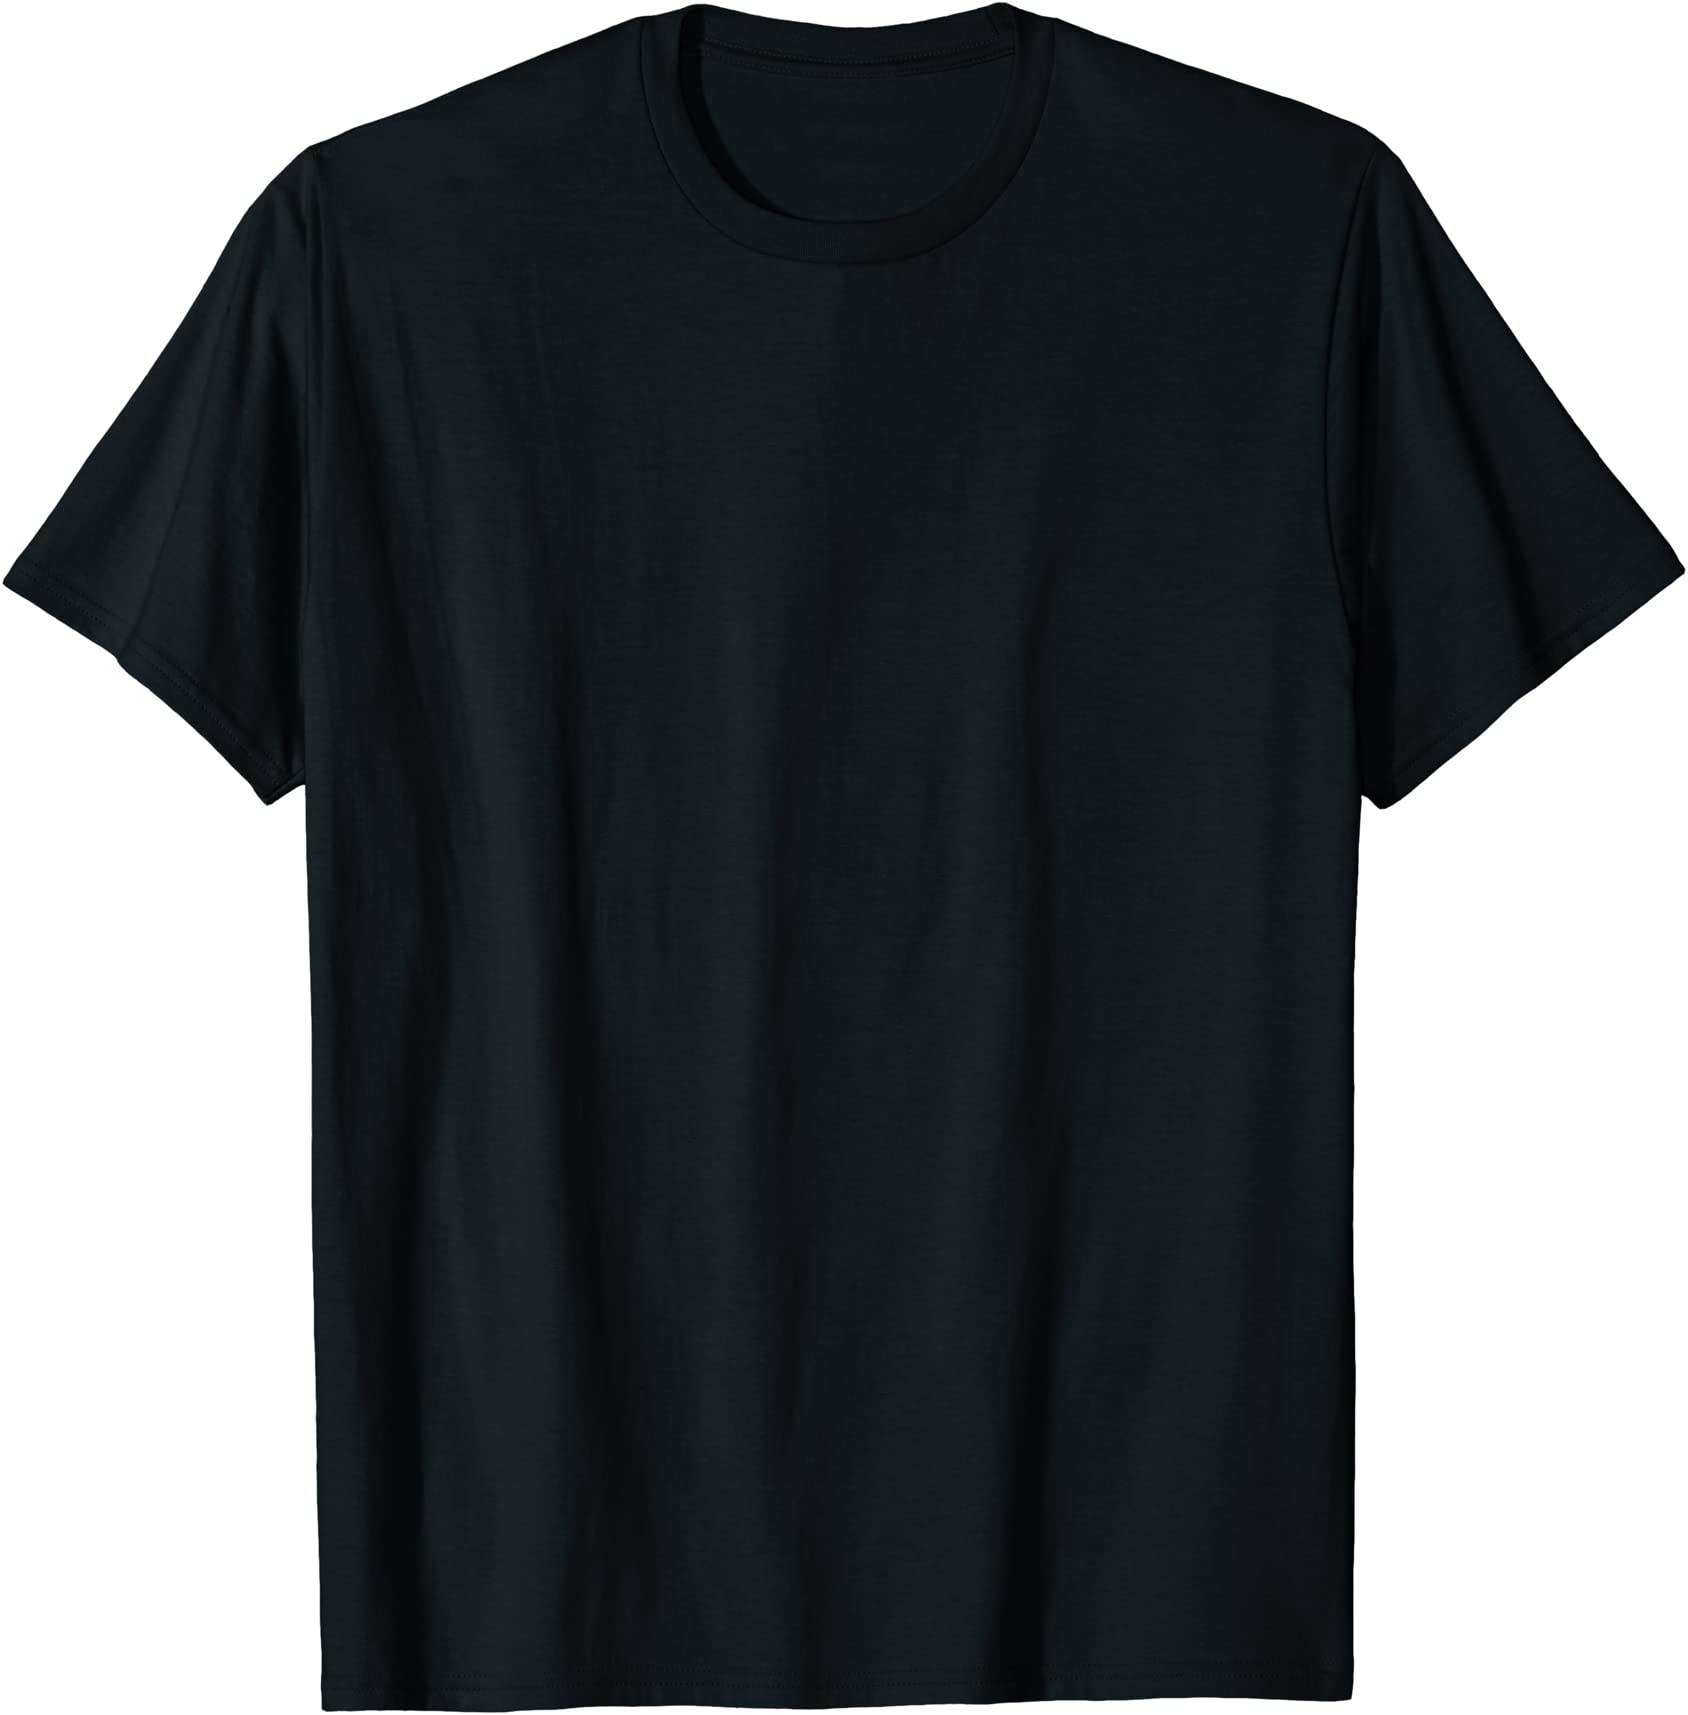 White Tiger Fashion Print Graphic Cotton Tee Shirt Short Sleeve T-Shirt for Men Women